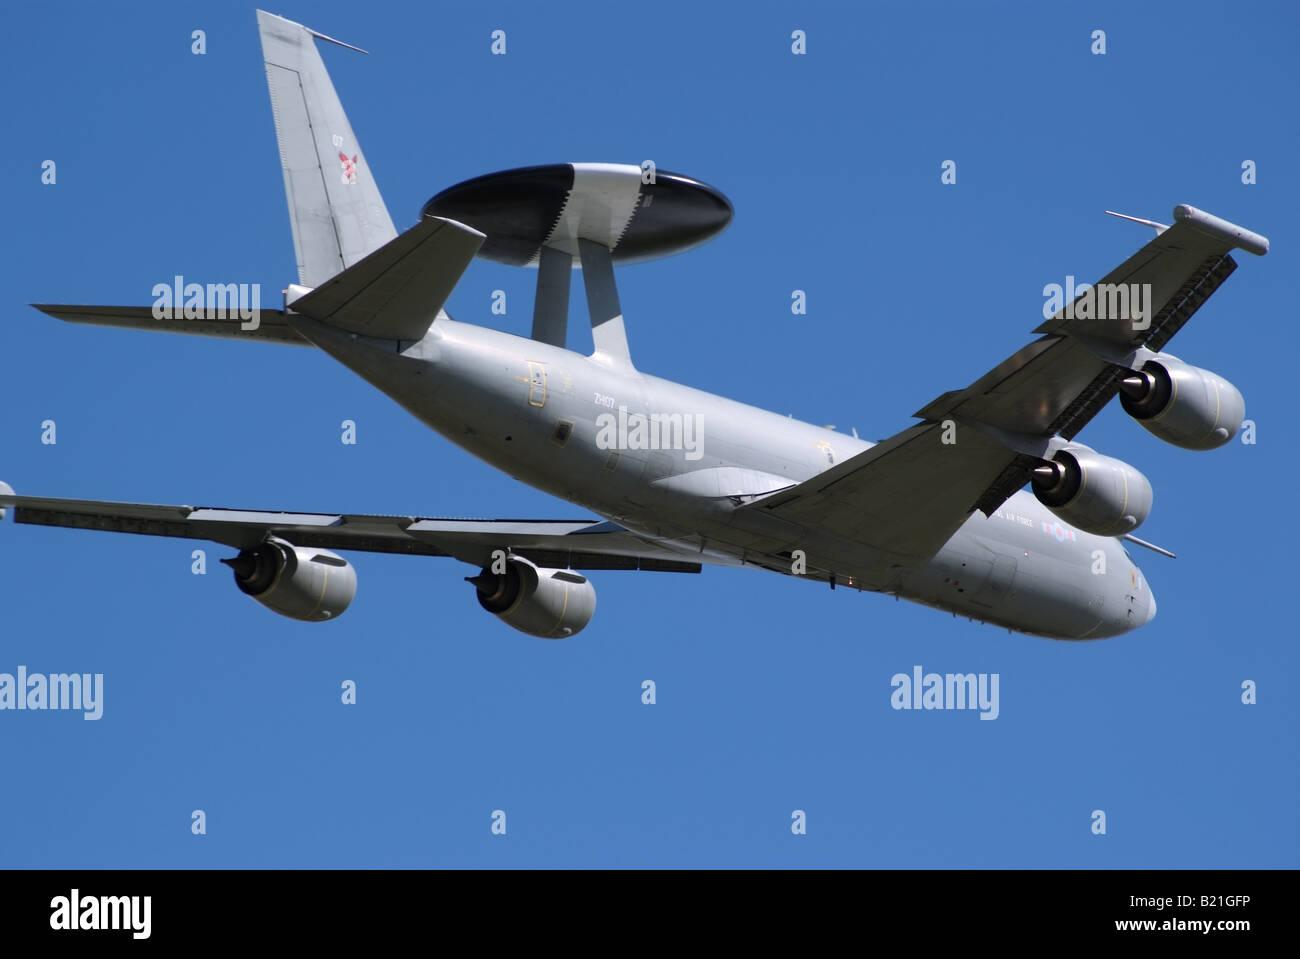 E3 Sentry Aew1 Raf Zh101 Inflight 200 Ife30514b